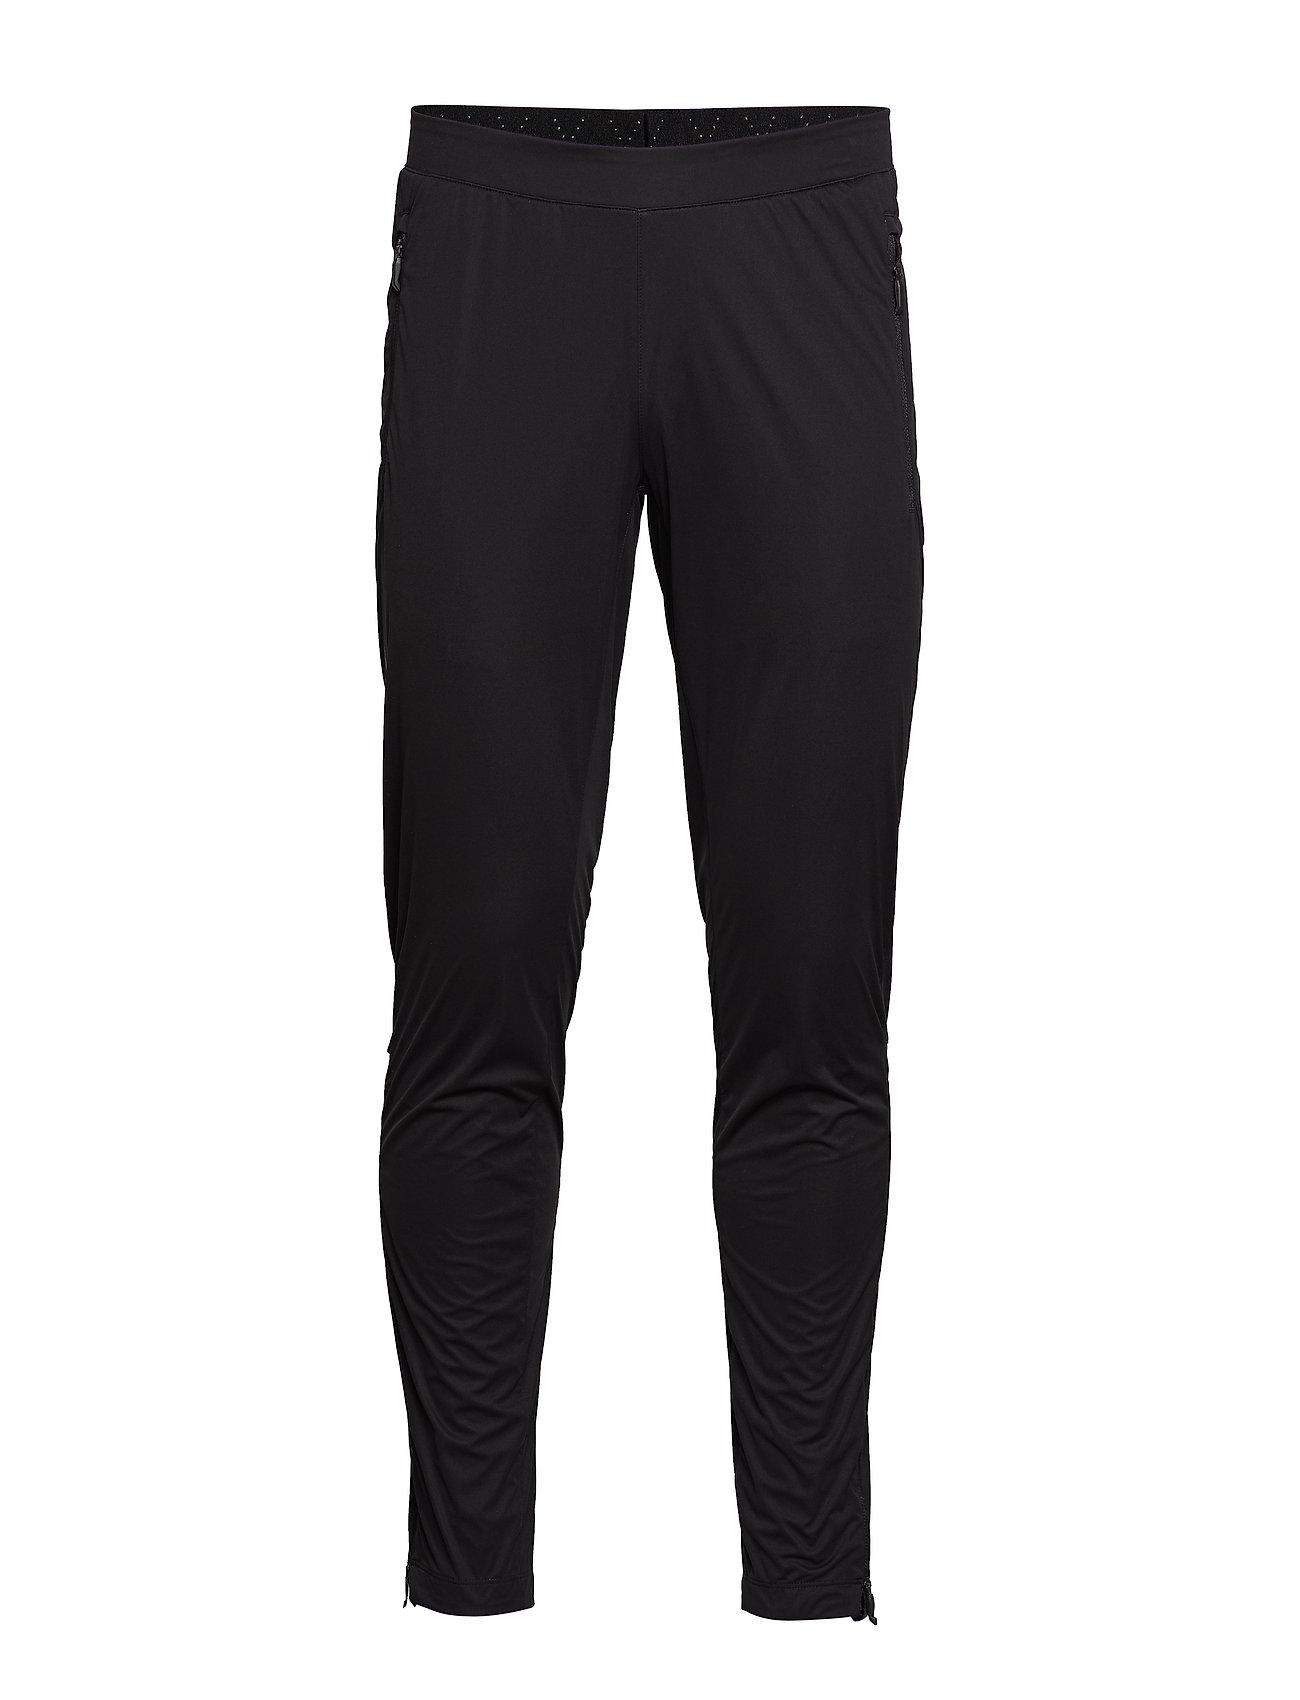 adidas Performance Xperior Pant - BLACK